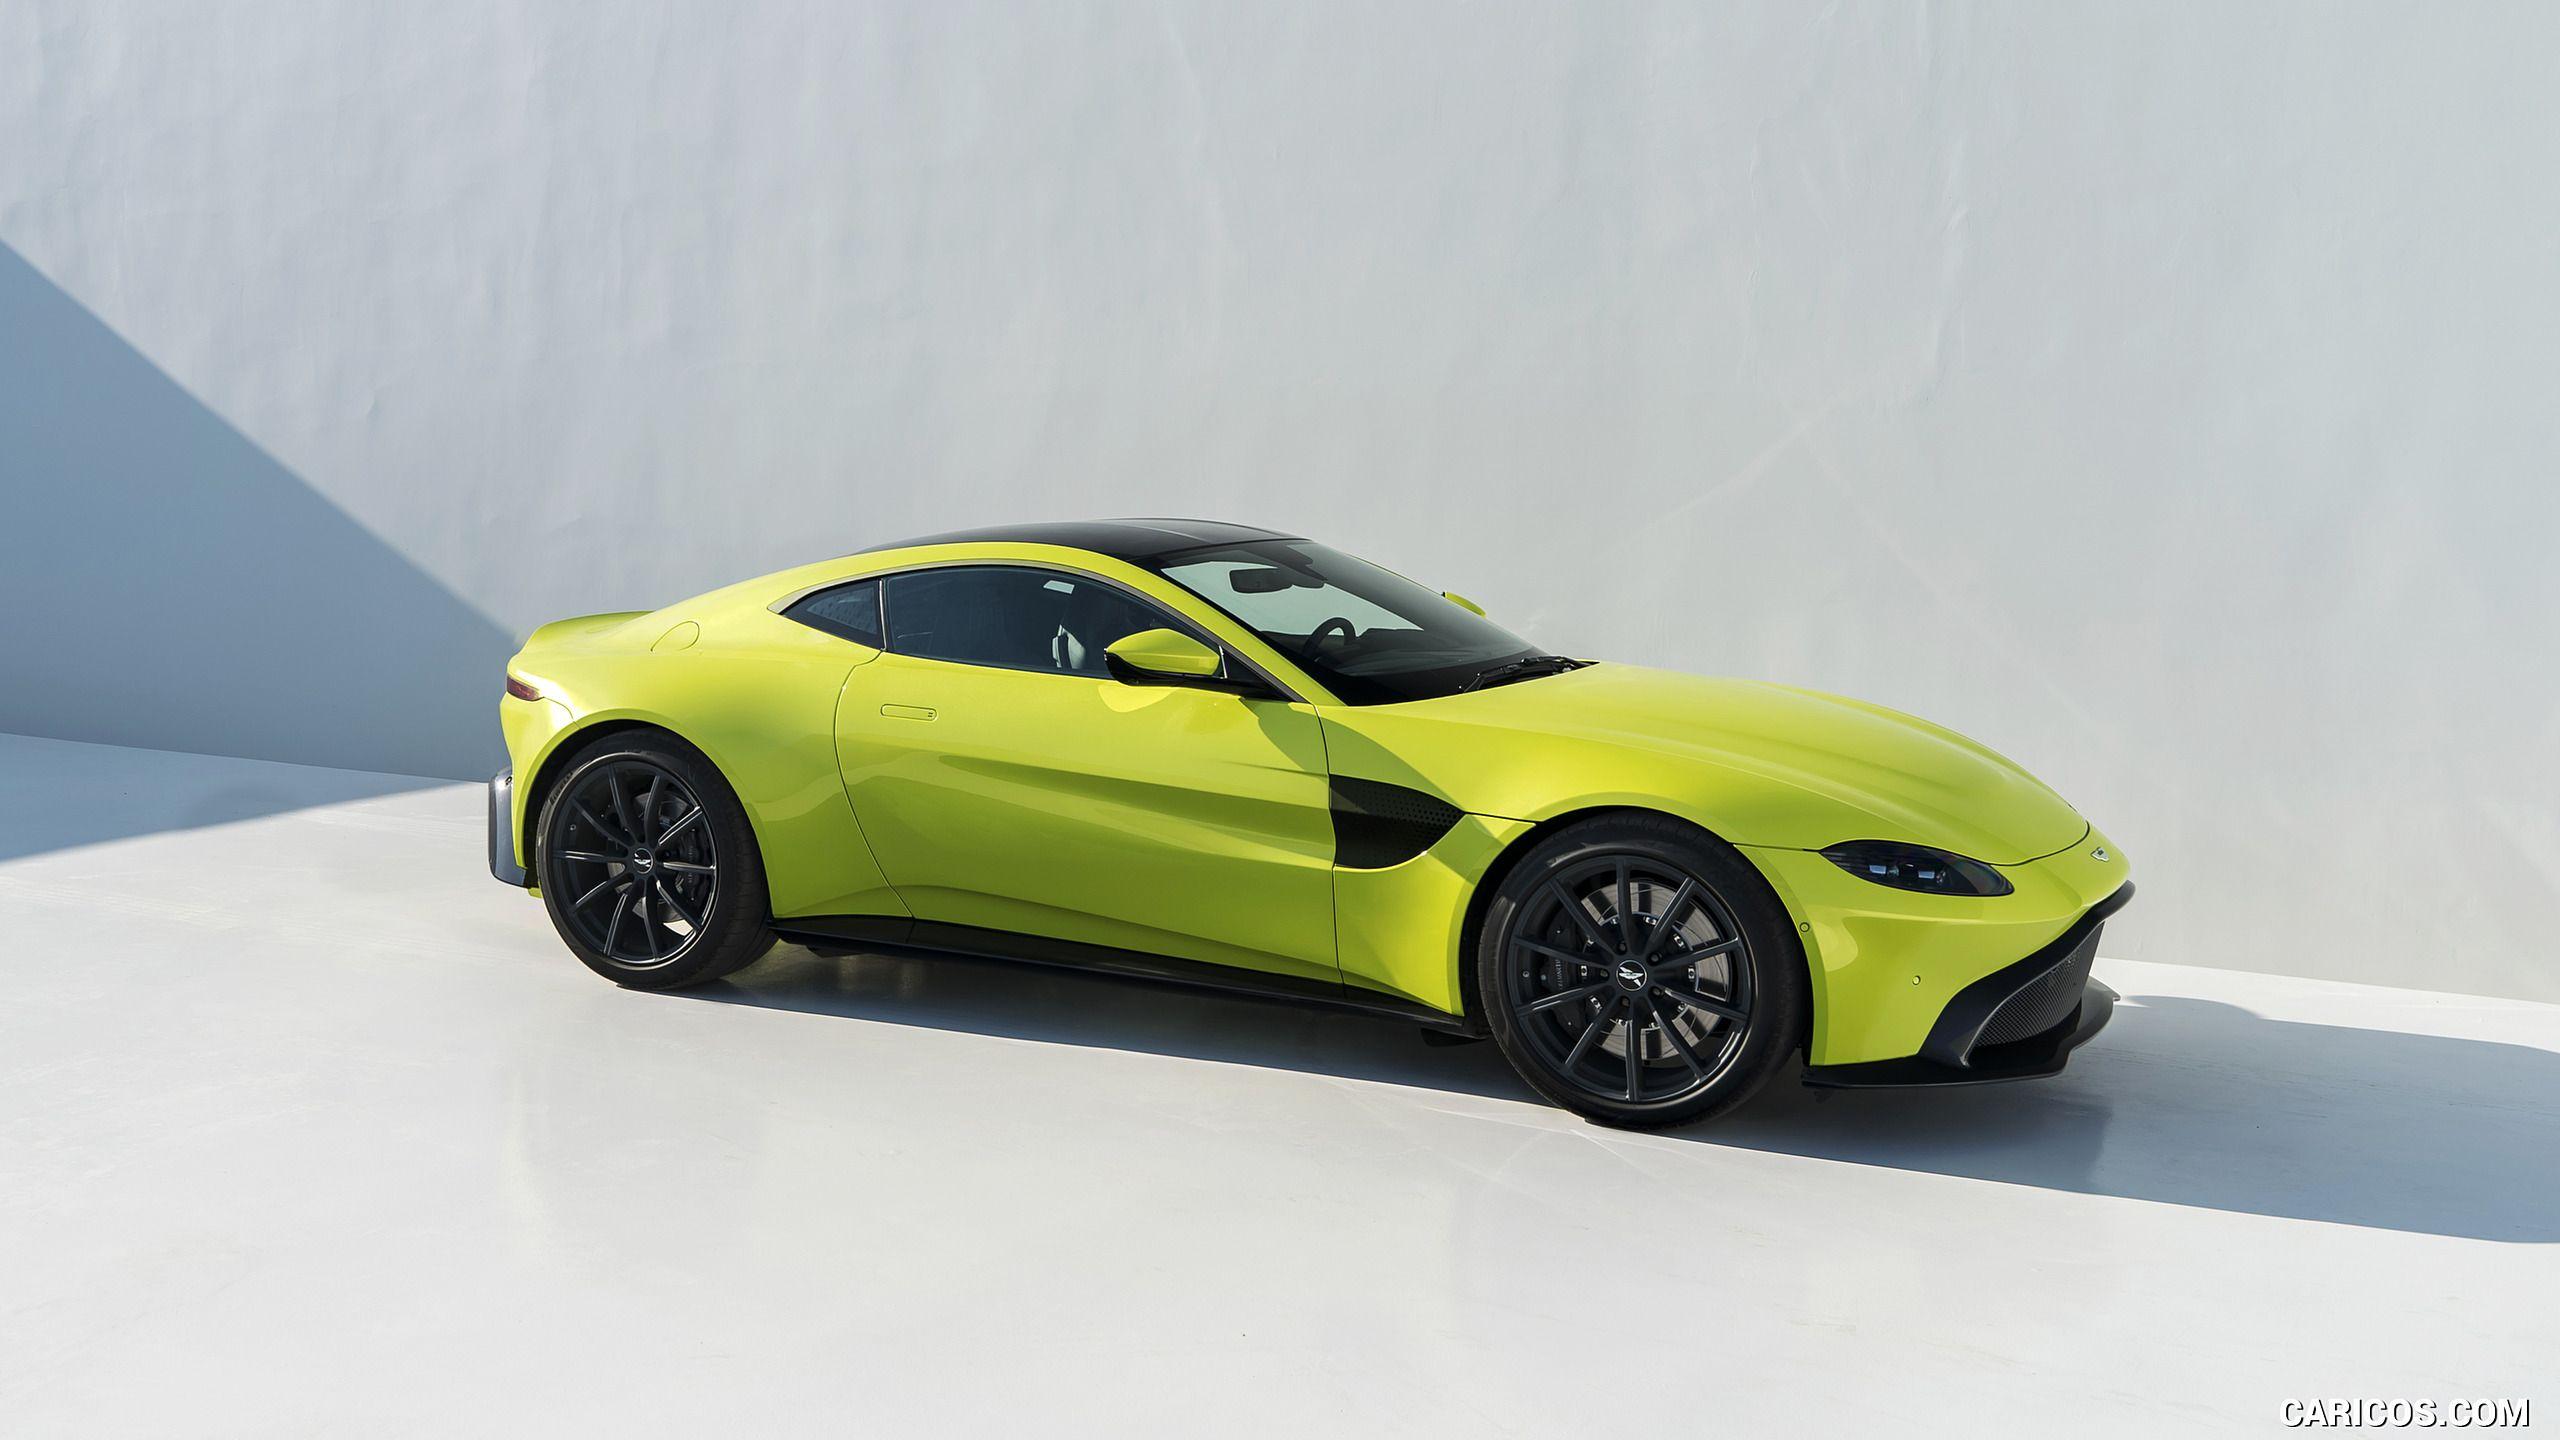 2019 Aston Martin Vantage Wallpaper アストンマーチン, ポルシェ 911